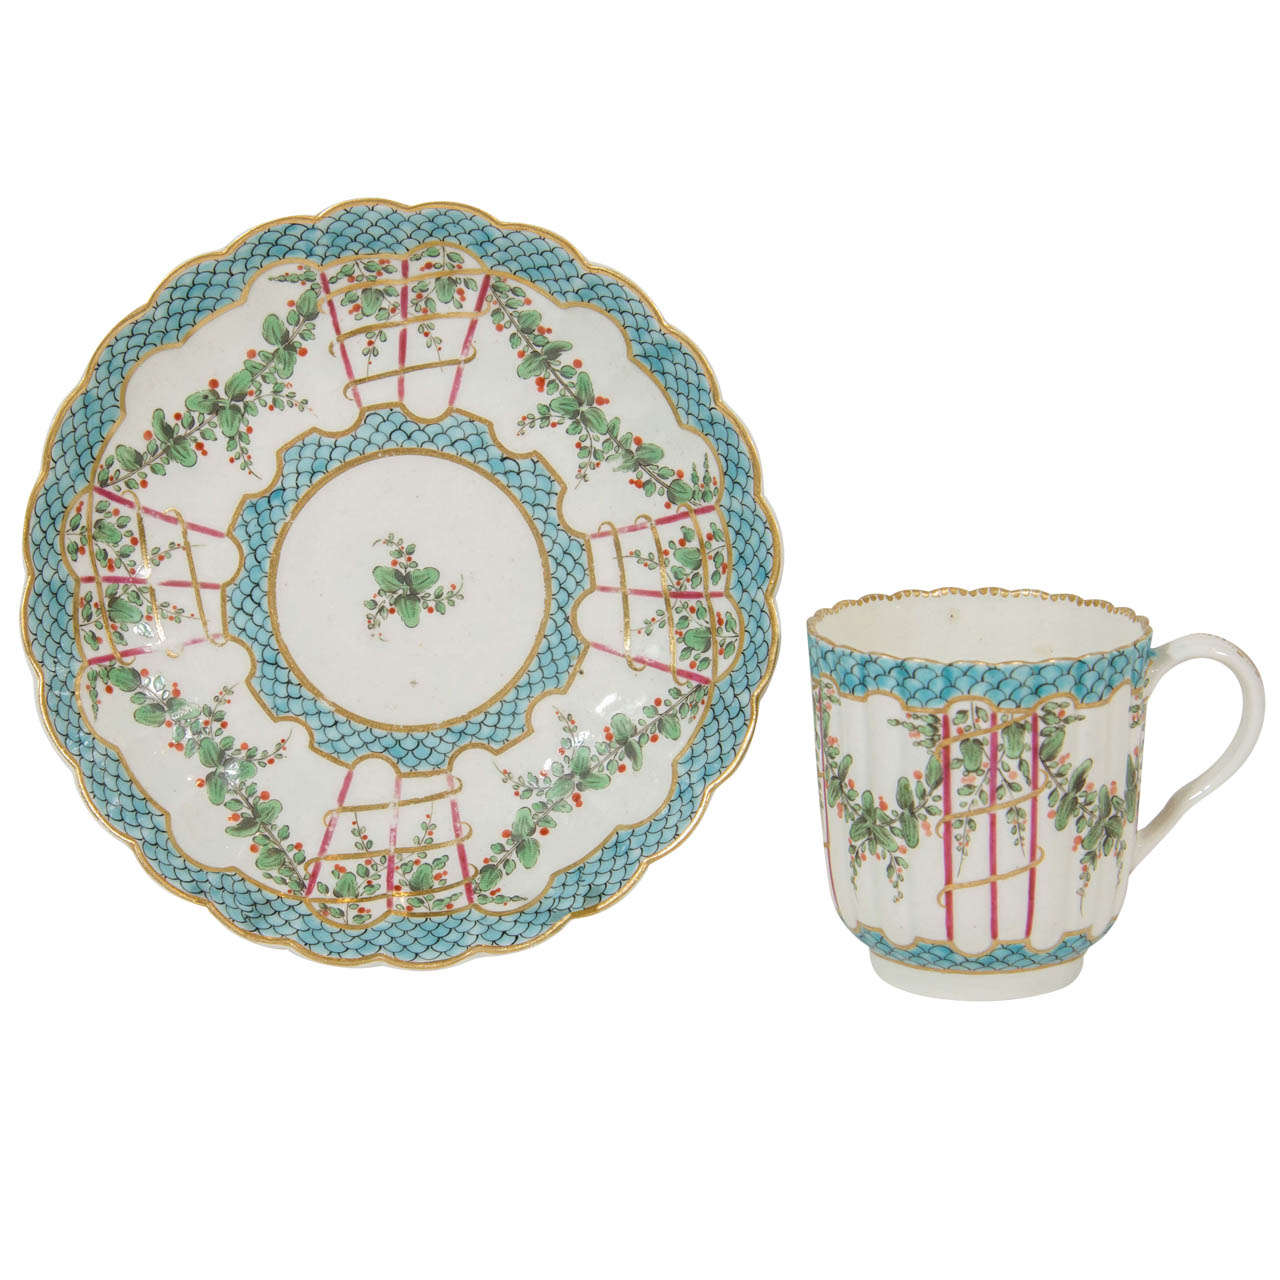 An 18th Century Soft Paste Worcester Hop Trellis Pattern